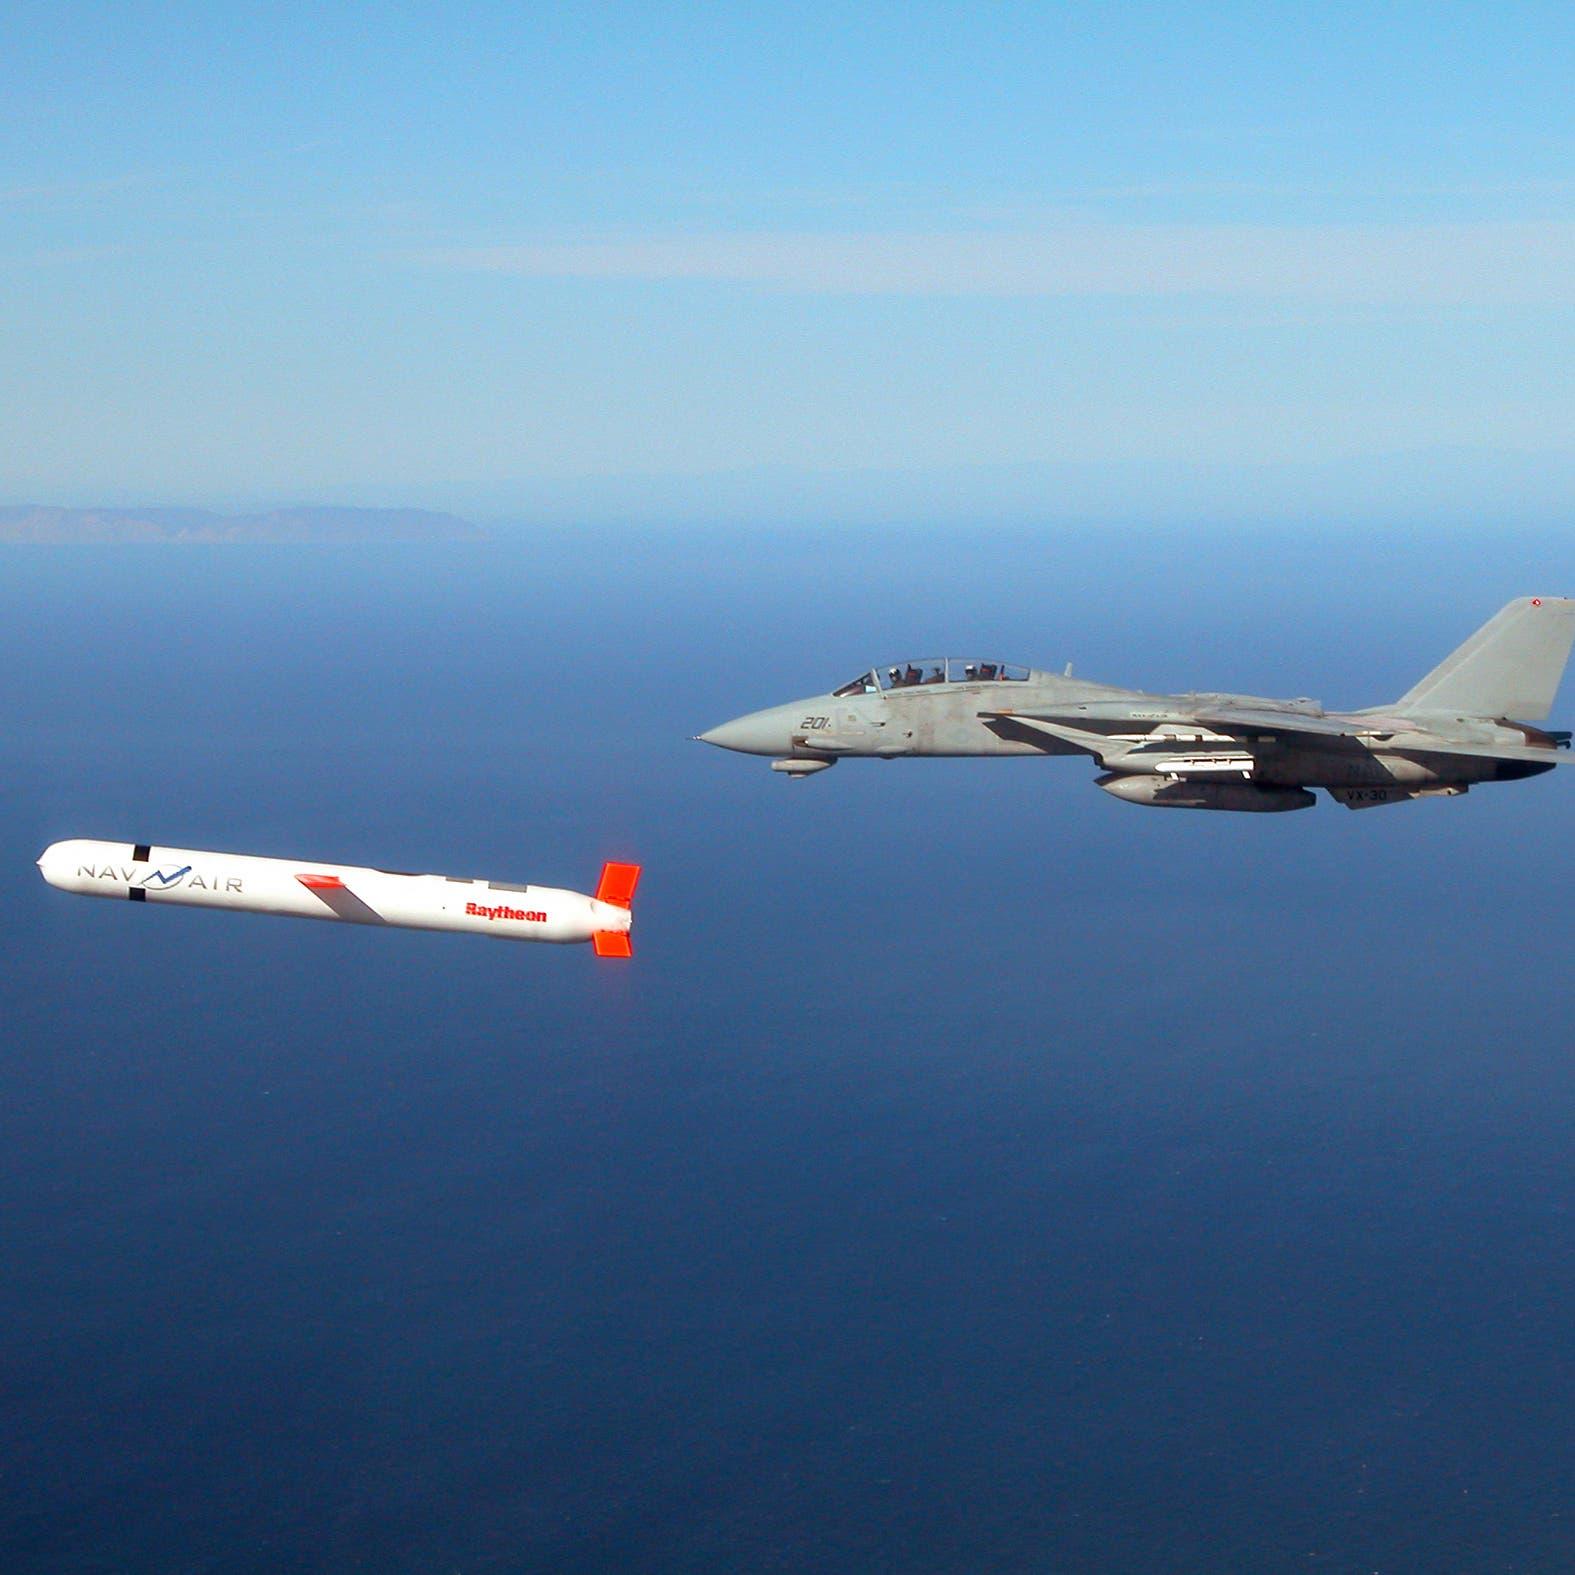 بمواصفات مميزة.. واشنطن تطوّر صاروخ توماهوك